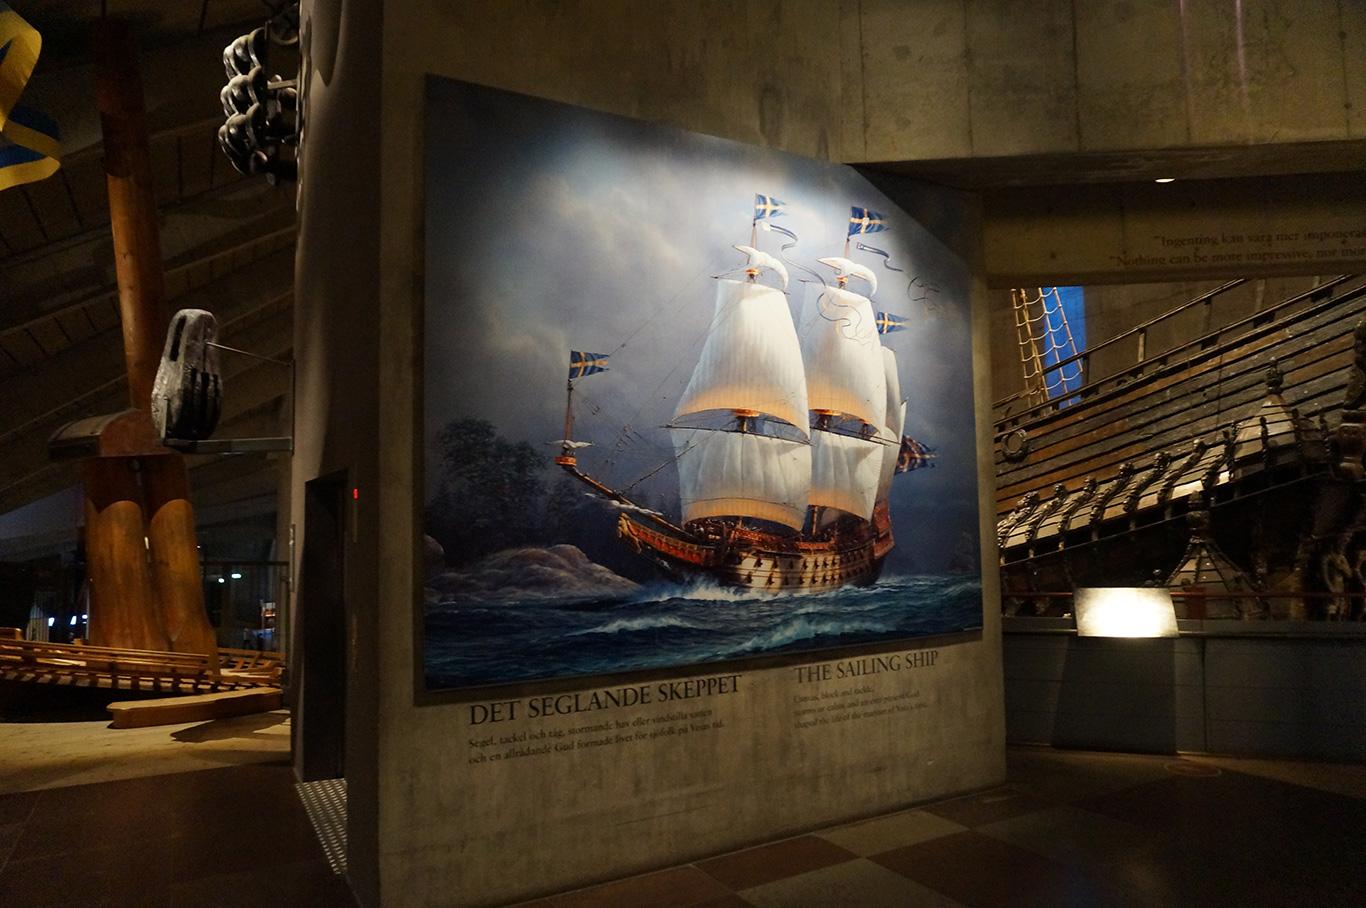 stockholm-venetia-scandinaviei-10